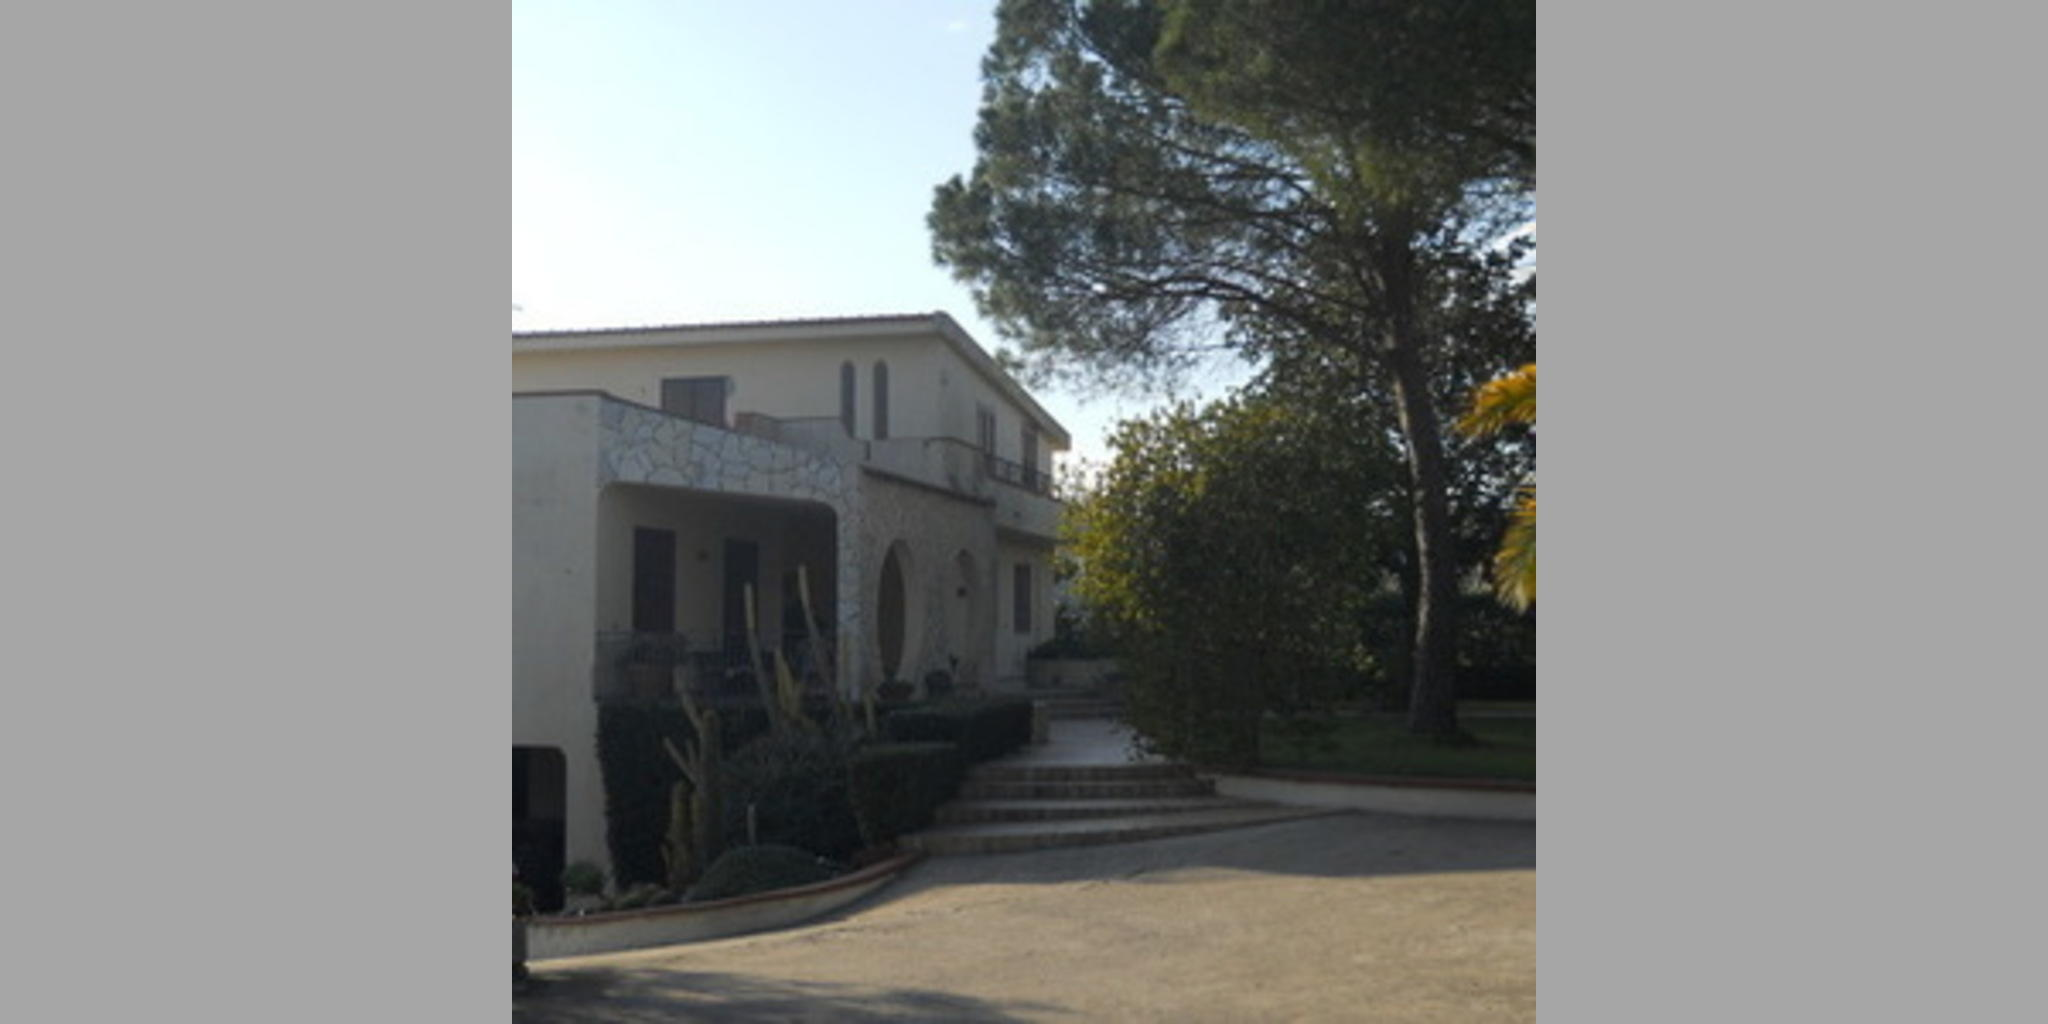 Appartement Canicattini Bagni - Contrada Valle Pezze